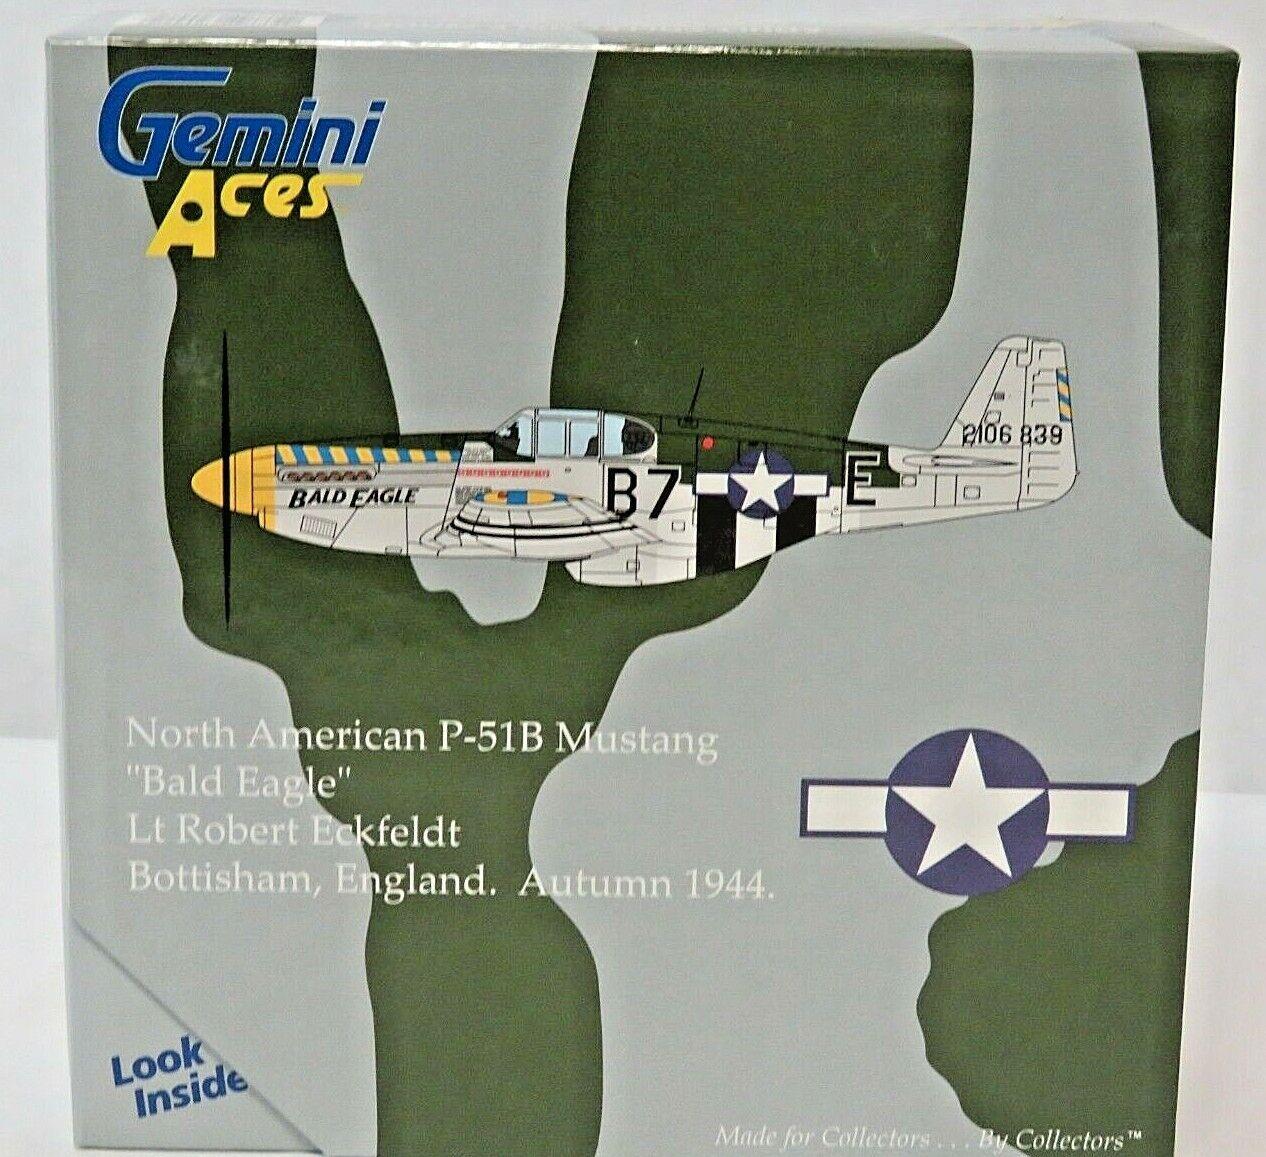 RARE 06 Gemini Aces North American P-51B Mustang GAUSA2001 1944 Bald Eagle 1 72